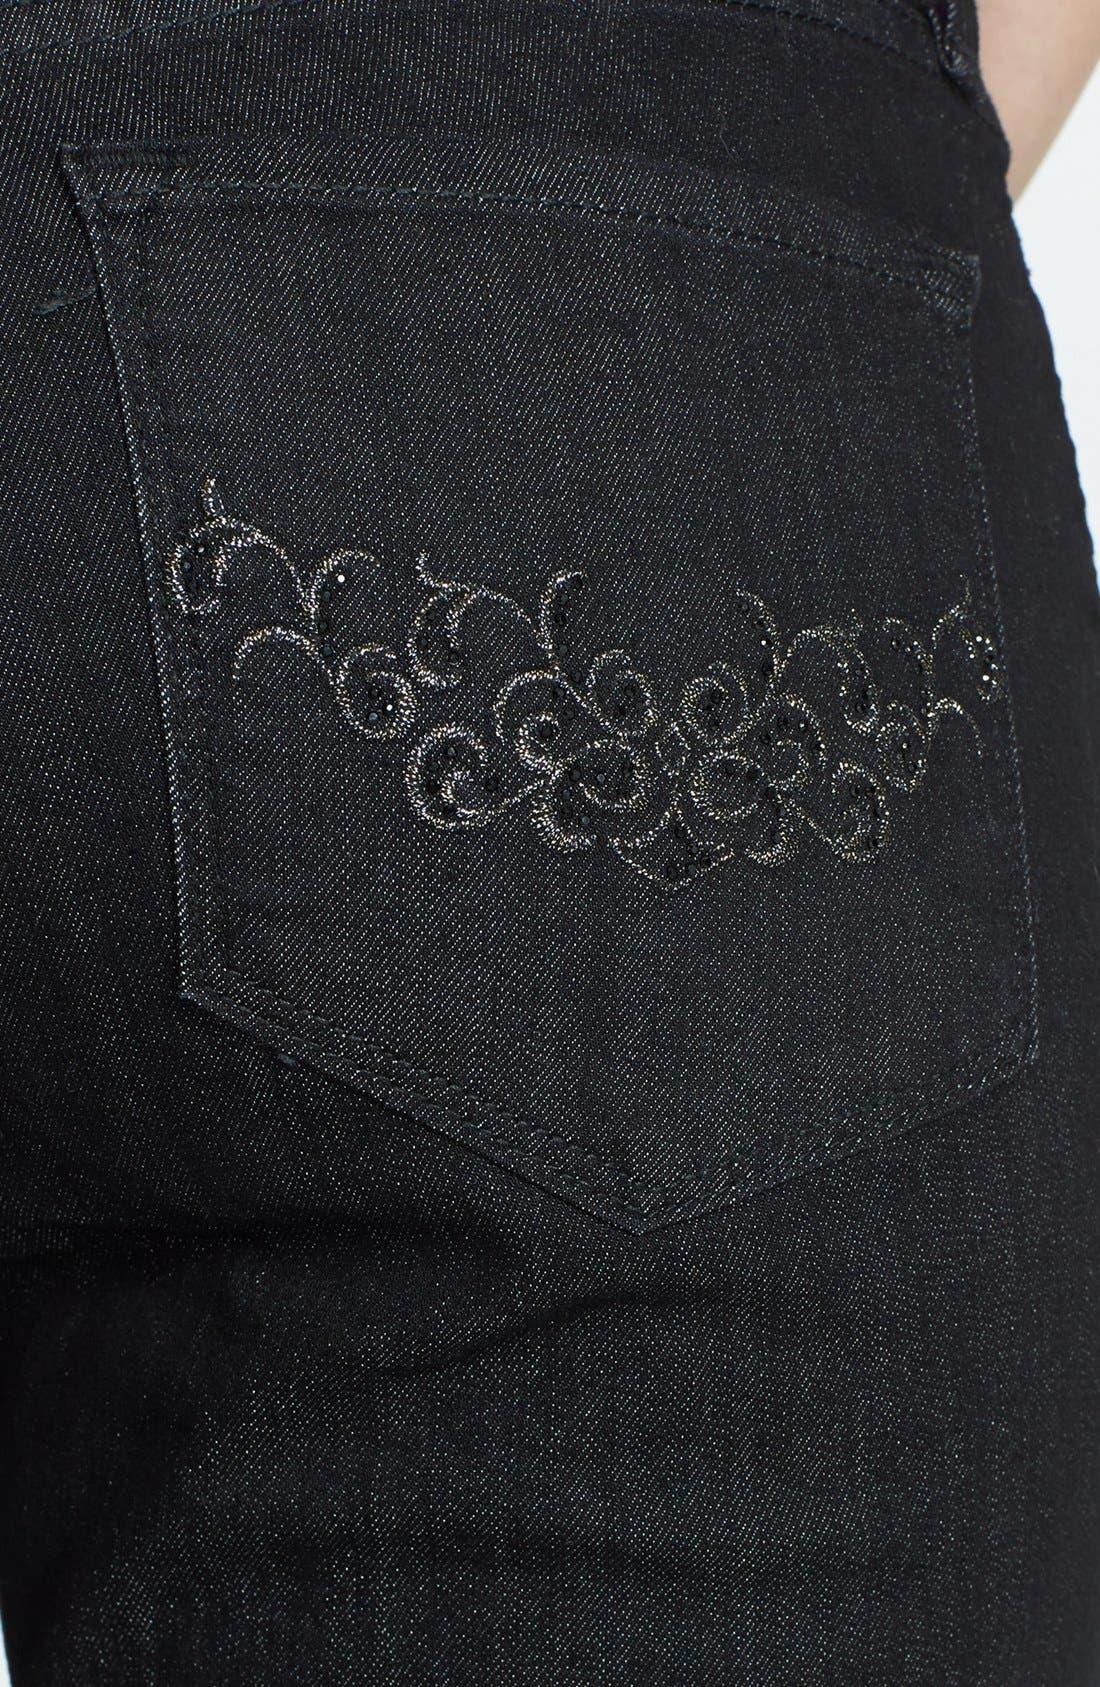 Alternate Image 2  - NYDJ 'Barbara' Stretch Bootcut Jeans (Dark Enzyme)